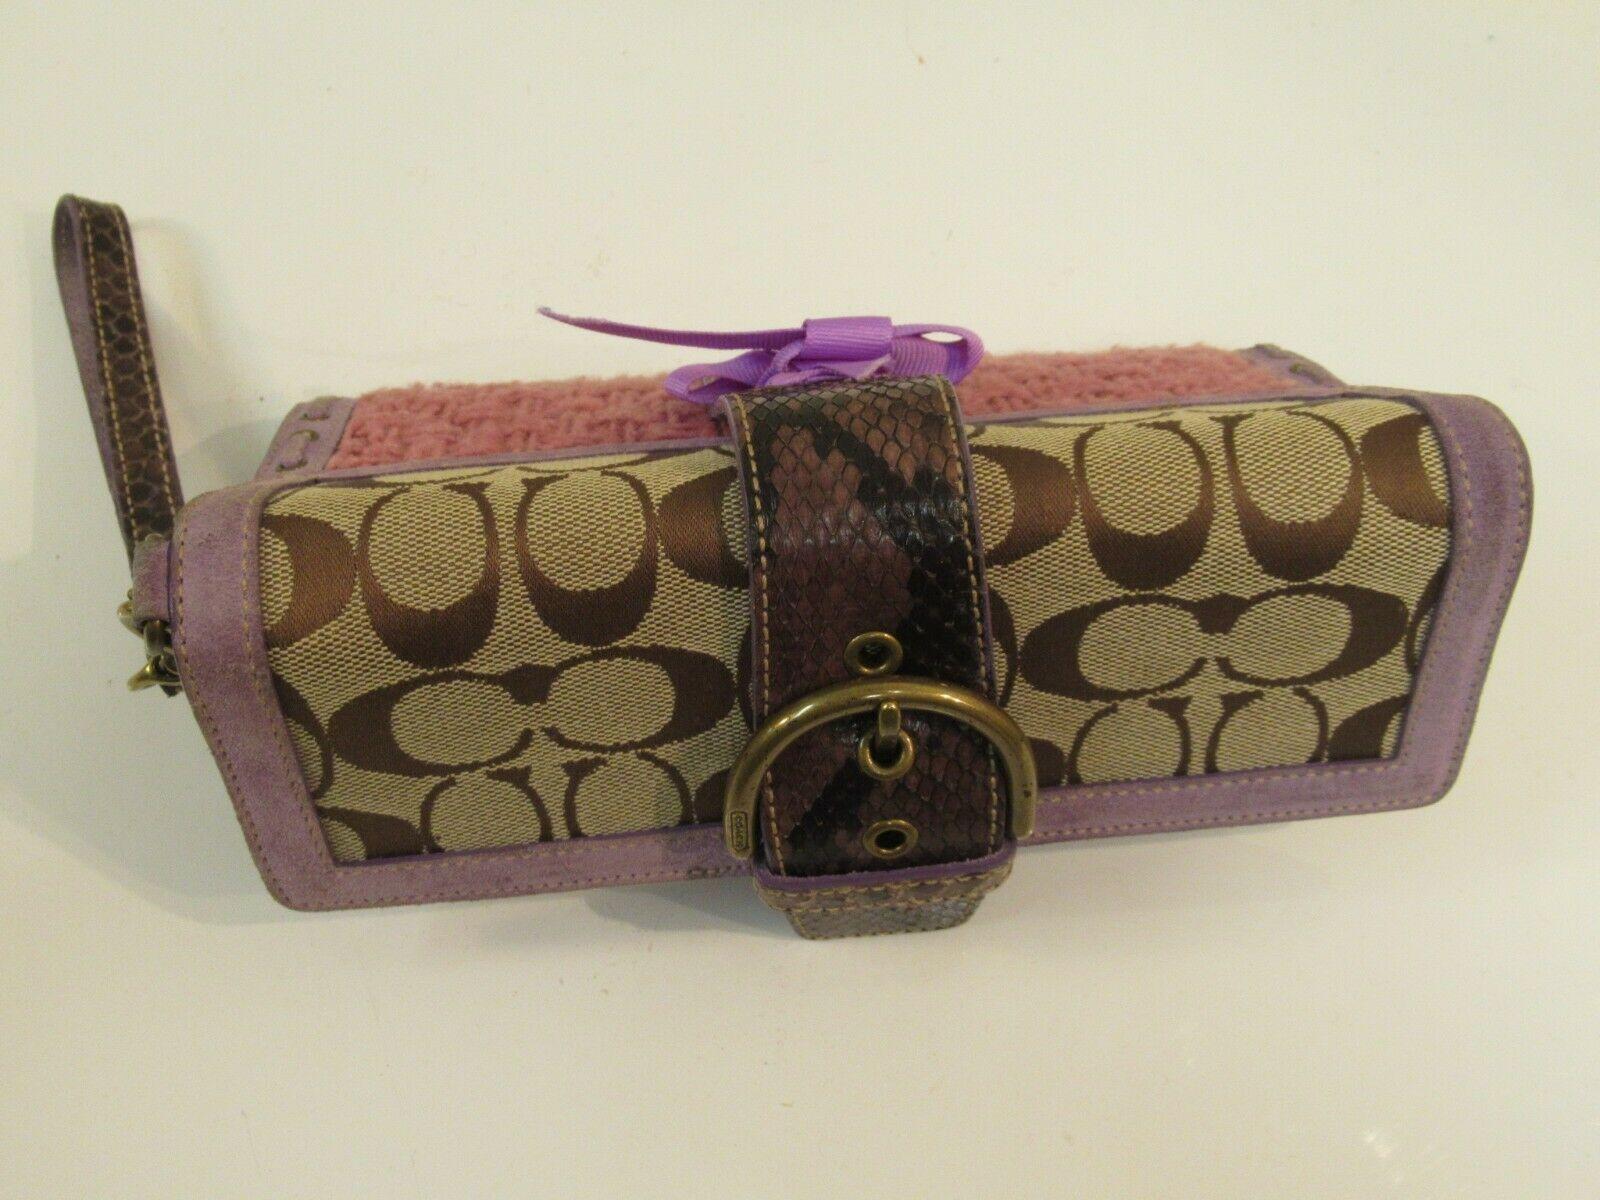 Coach Wristlet Tweed Purple Suede Wallet Buckle Handbag Clutch Monogram C image 11